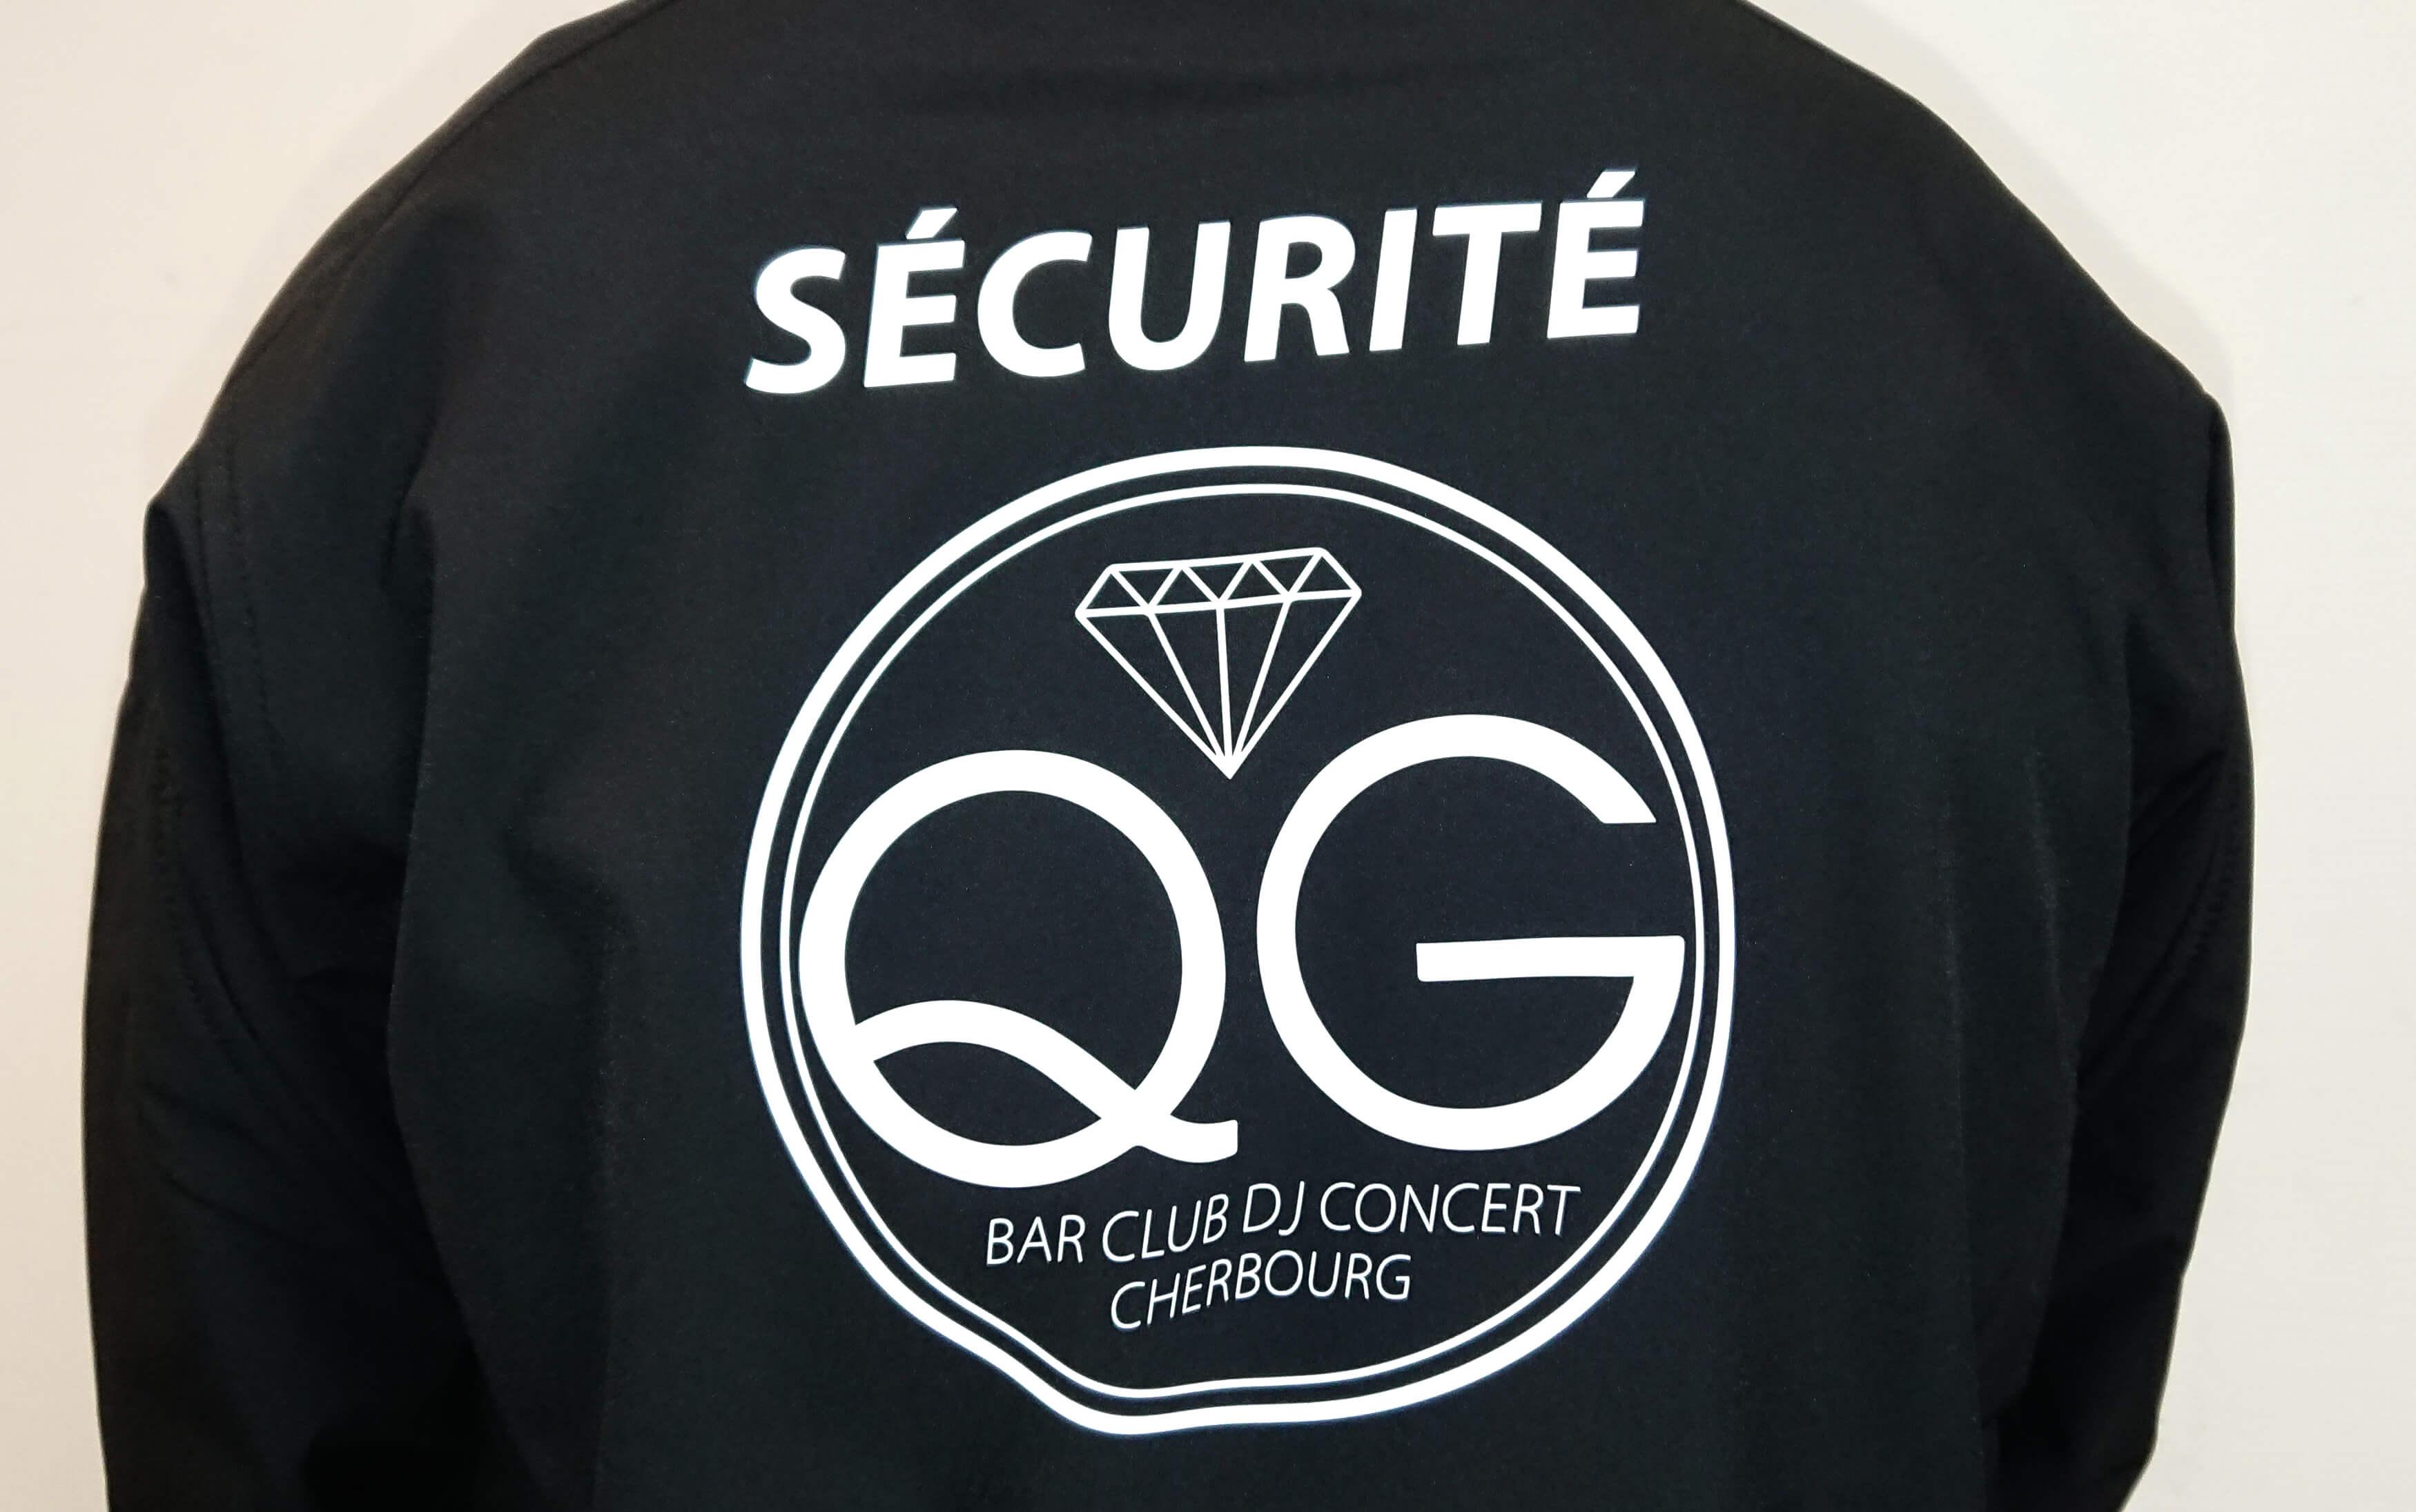 33d1b6801db94 marquage-textile-amc-repro-manche-qg-securite-veste-